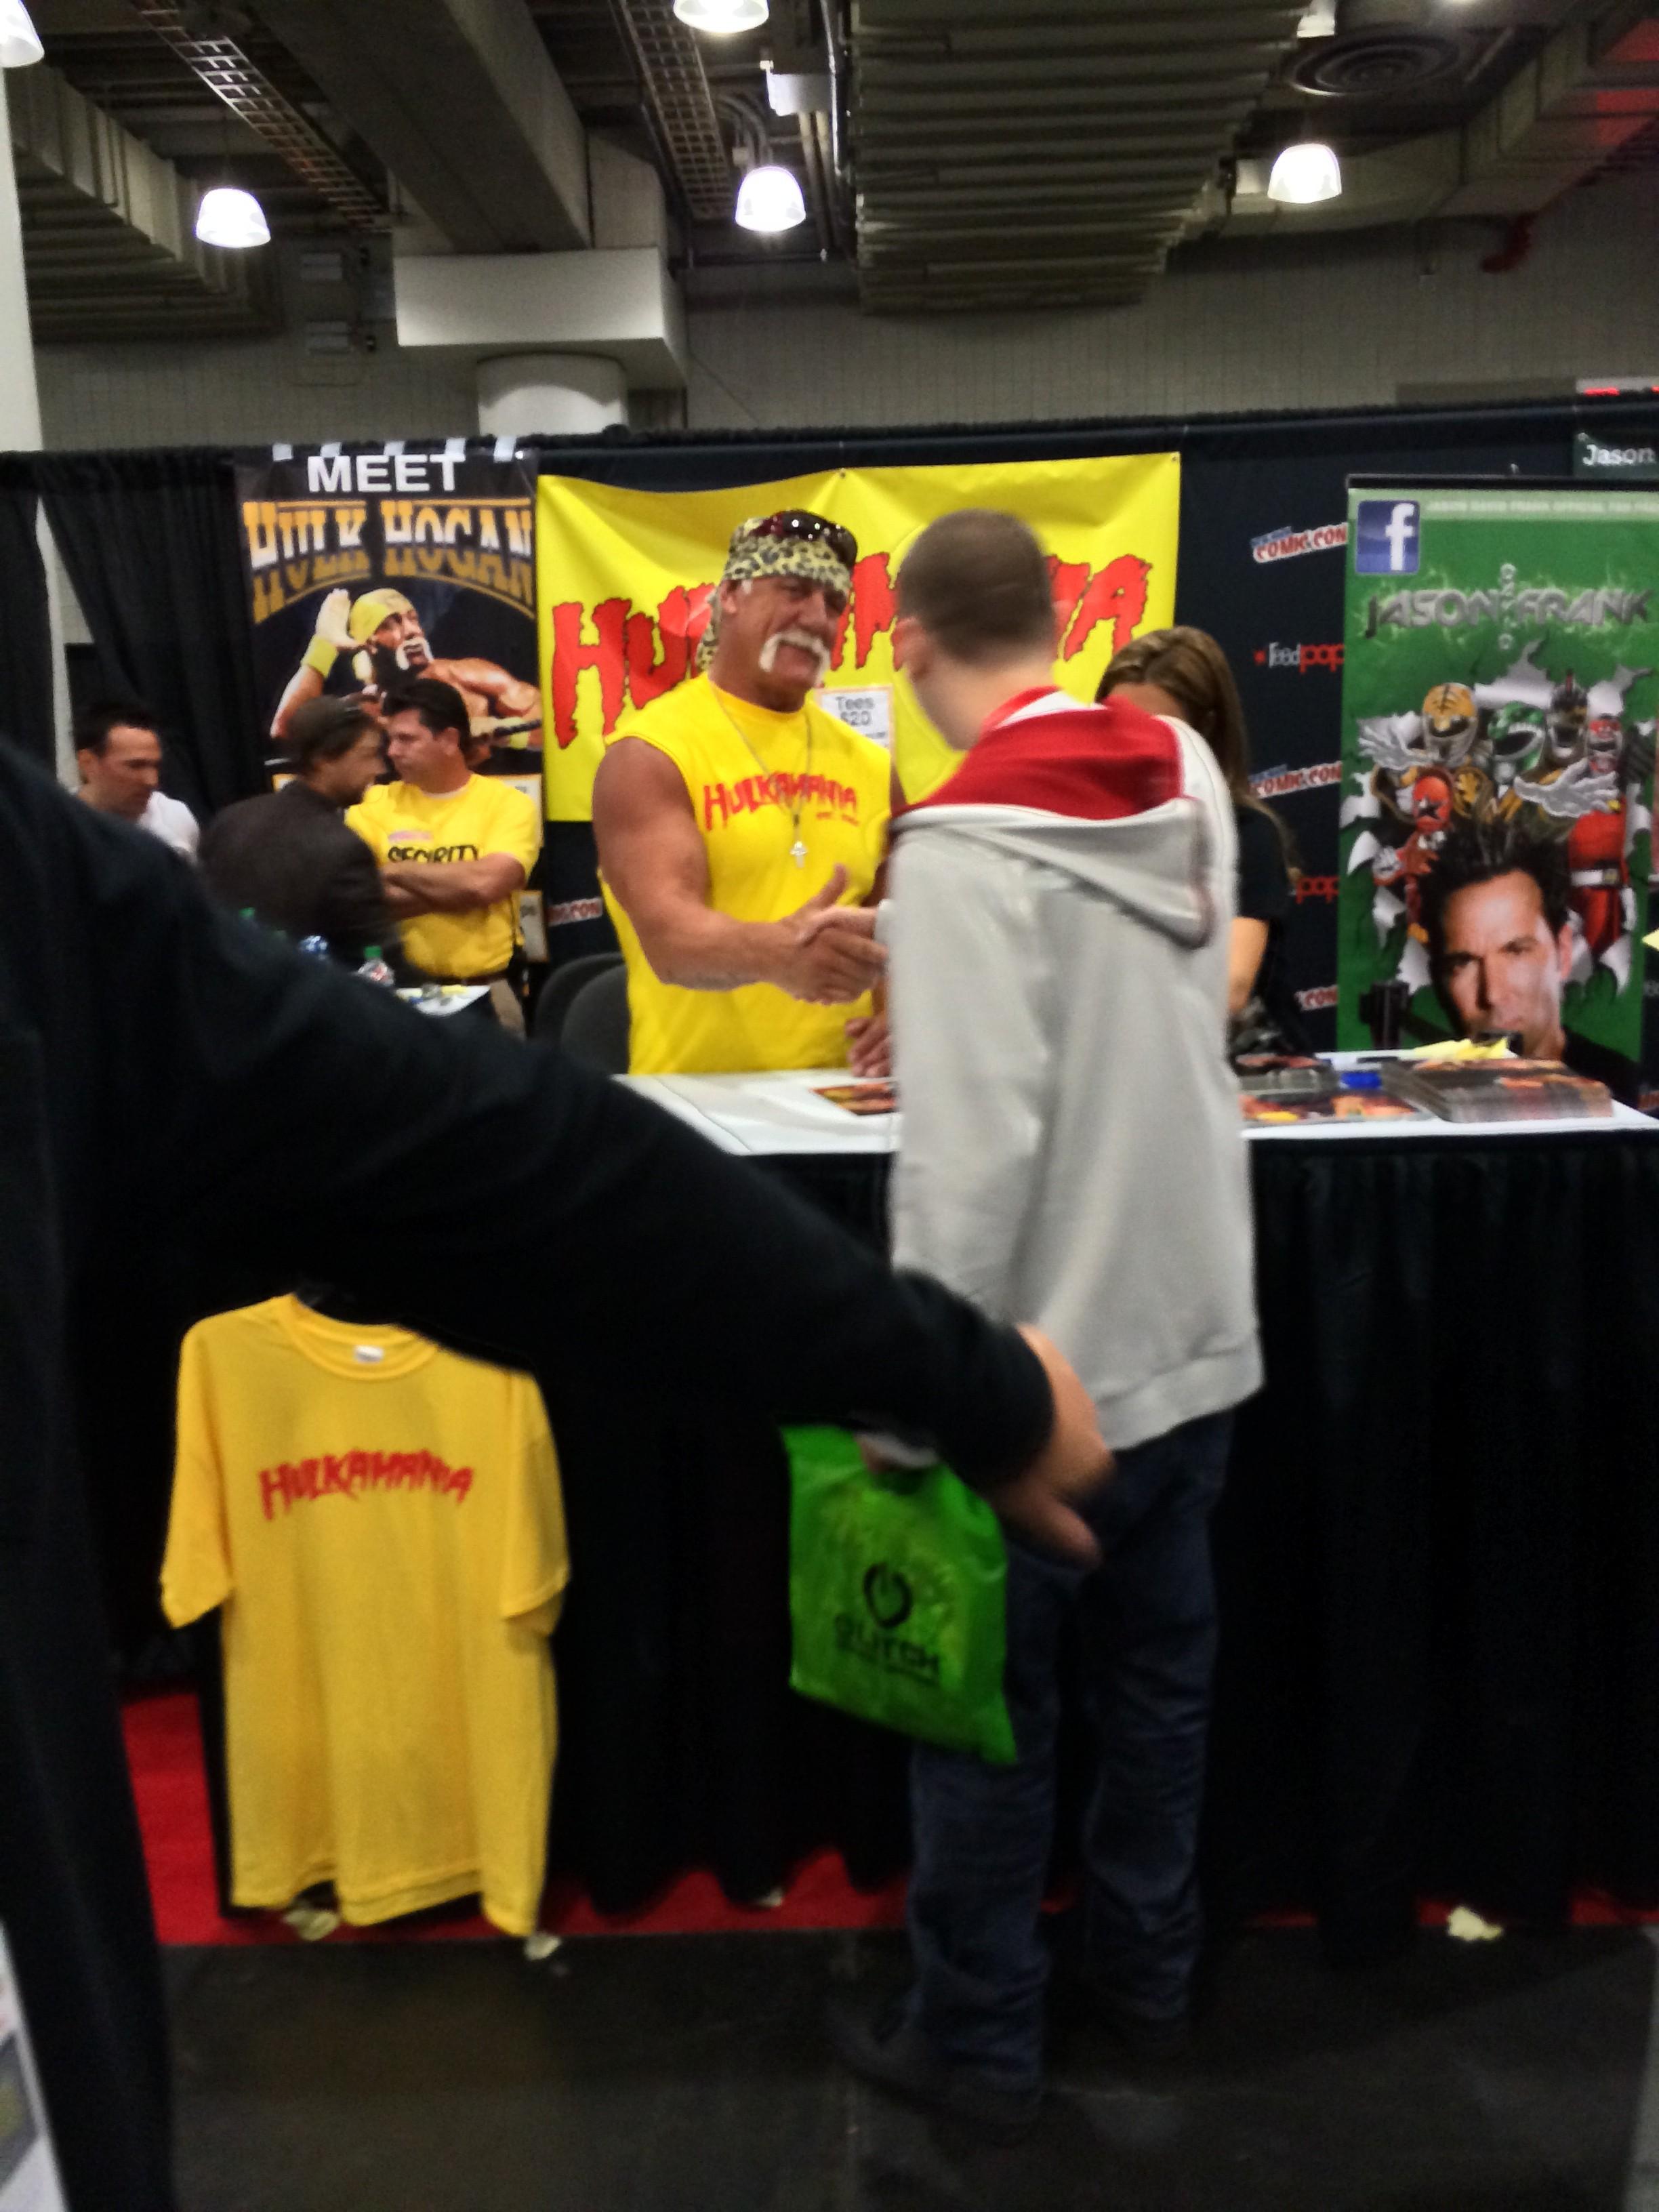 WWE Hulk Hogan wallpapers | Hogan Pictures bwin vegas casino get £20 cash back free demo a game verwandte  ~ WWE Superstars,WWE ...